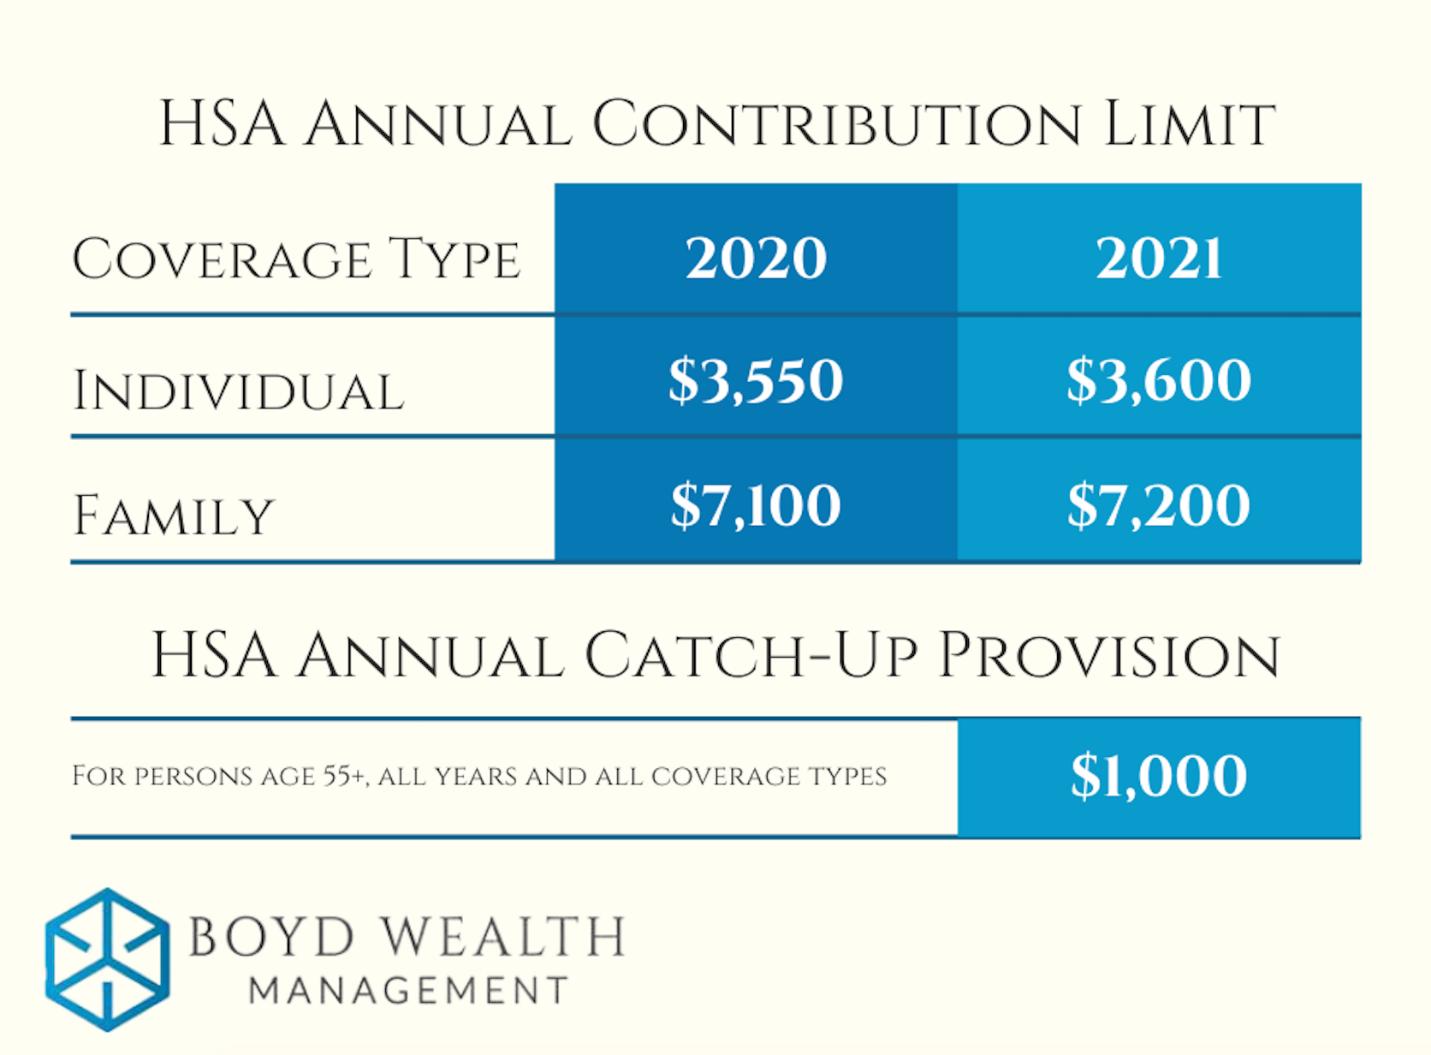 HSA Annual Contribution Limits